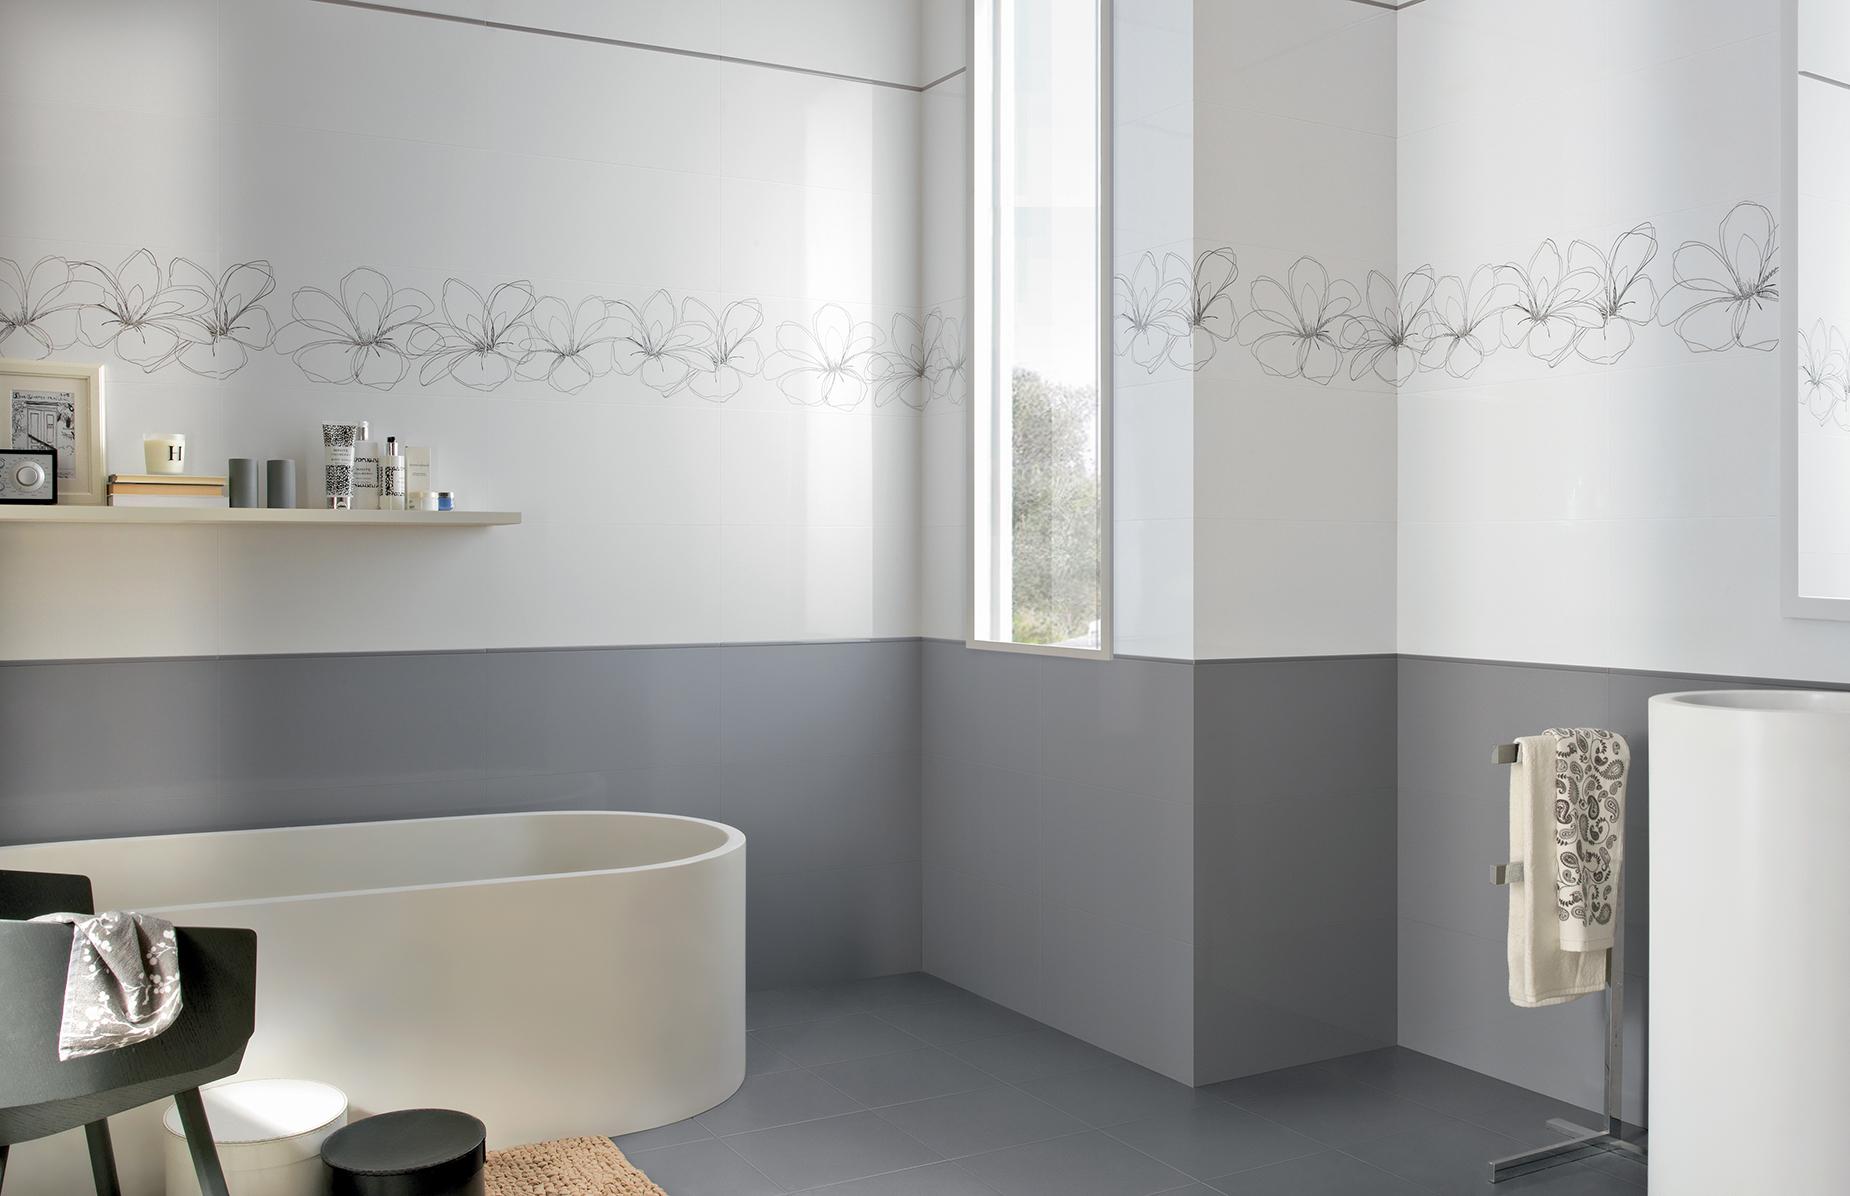 Serie soft rivestimento moda - Rivestimento bagno moderno ...